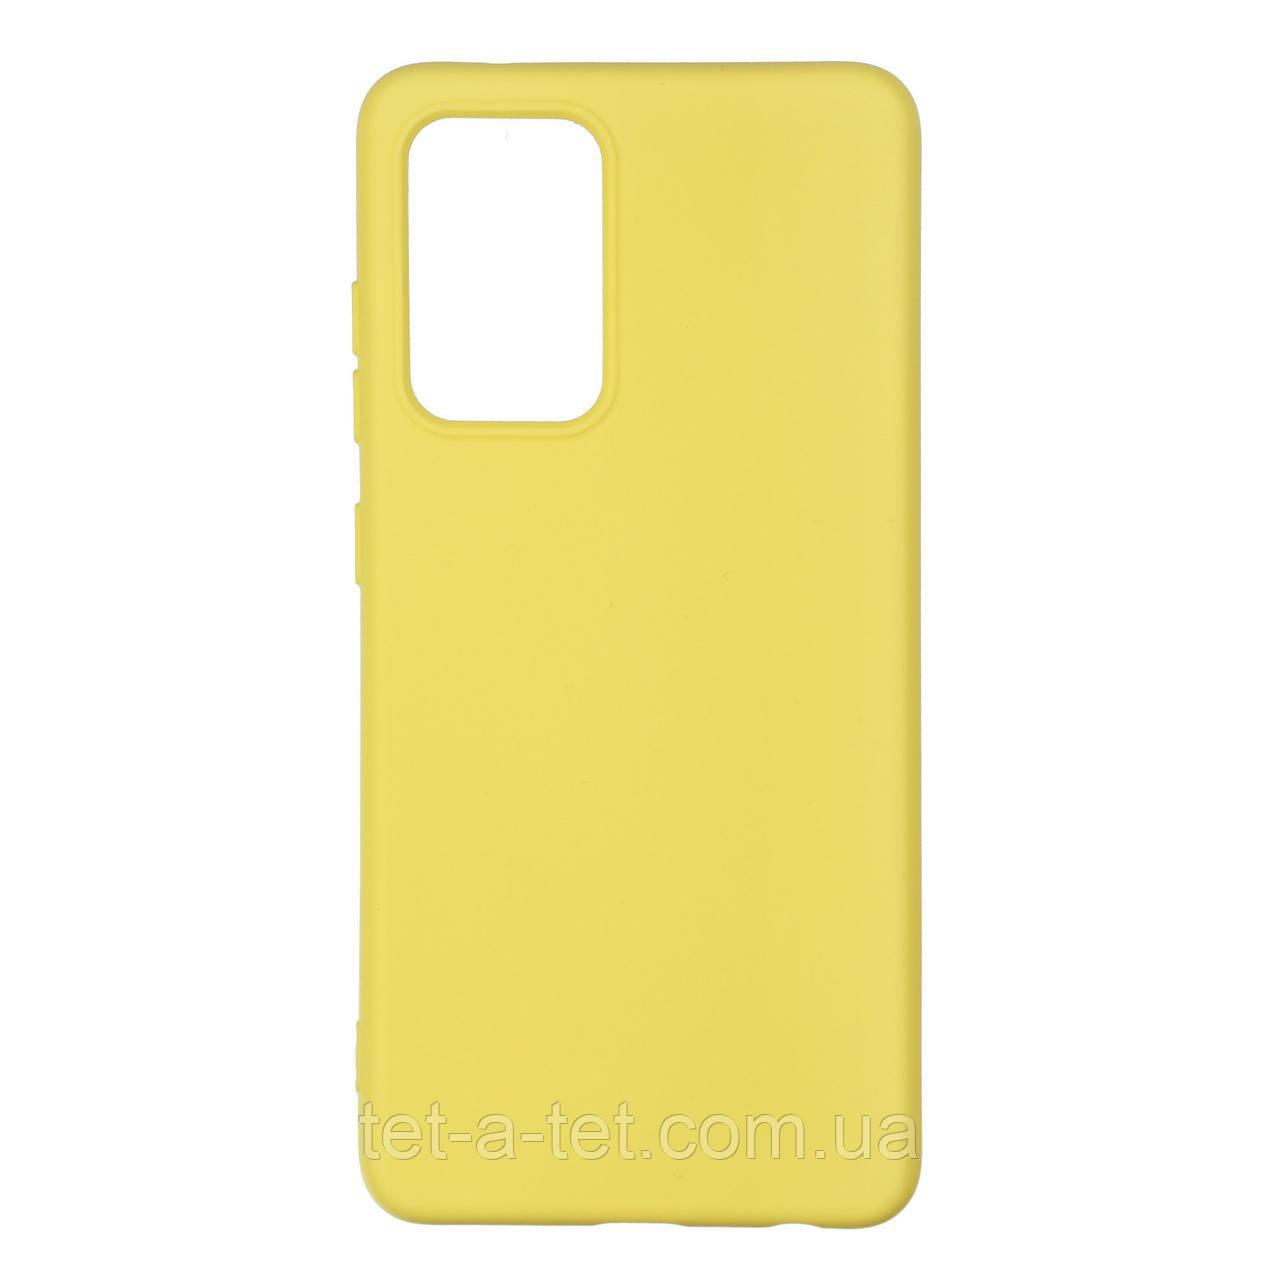 Чохол силіконовий ArmorStandart ICON Case for Samsung A52 (A525) Yellow